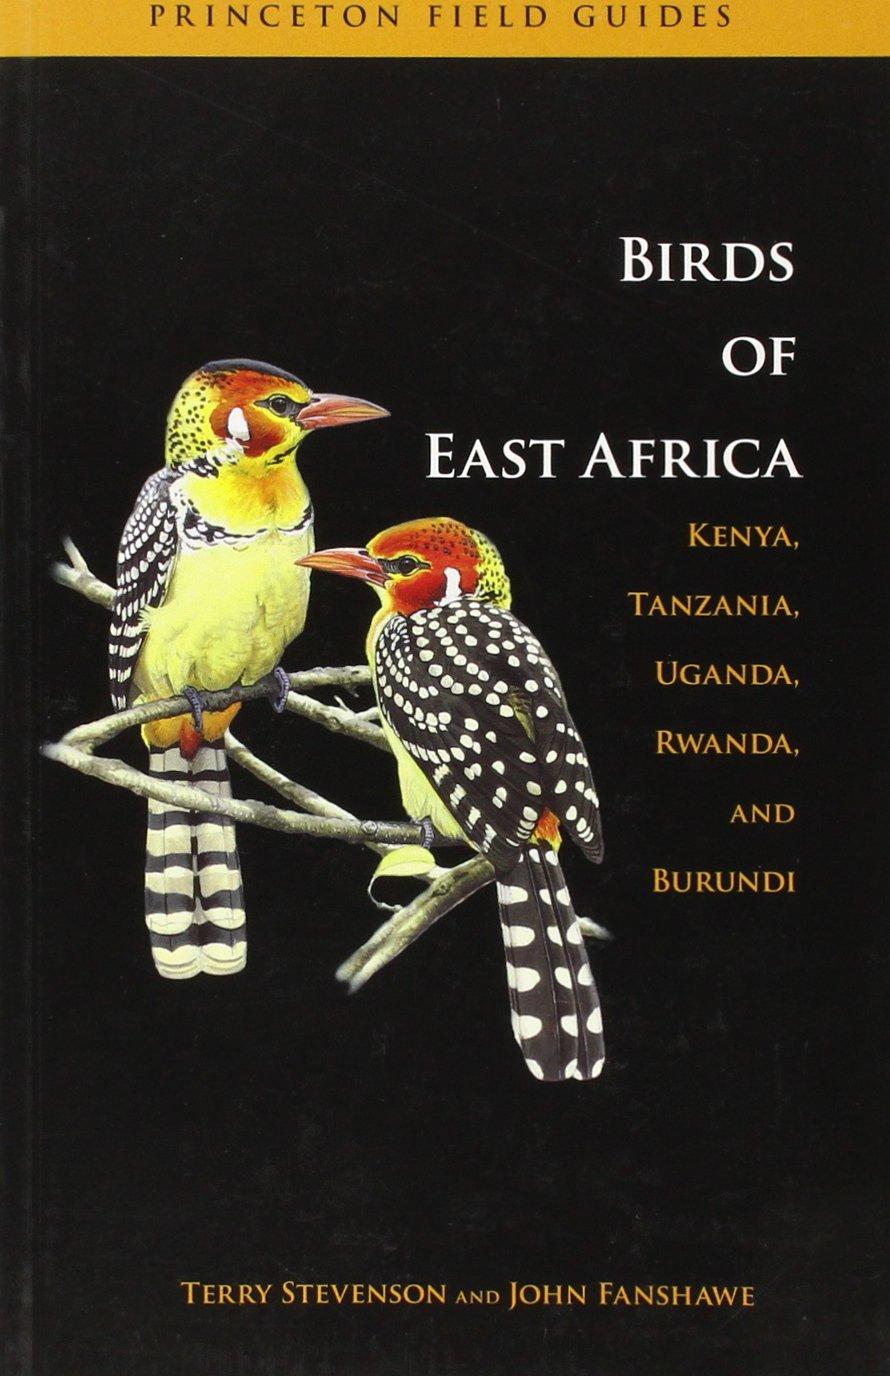 The Birds of East Africa: Kenya, Tanzania, Uganda, Rwanda, Burundi (Princeton Field Guides)